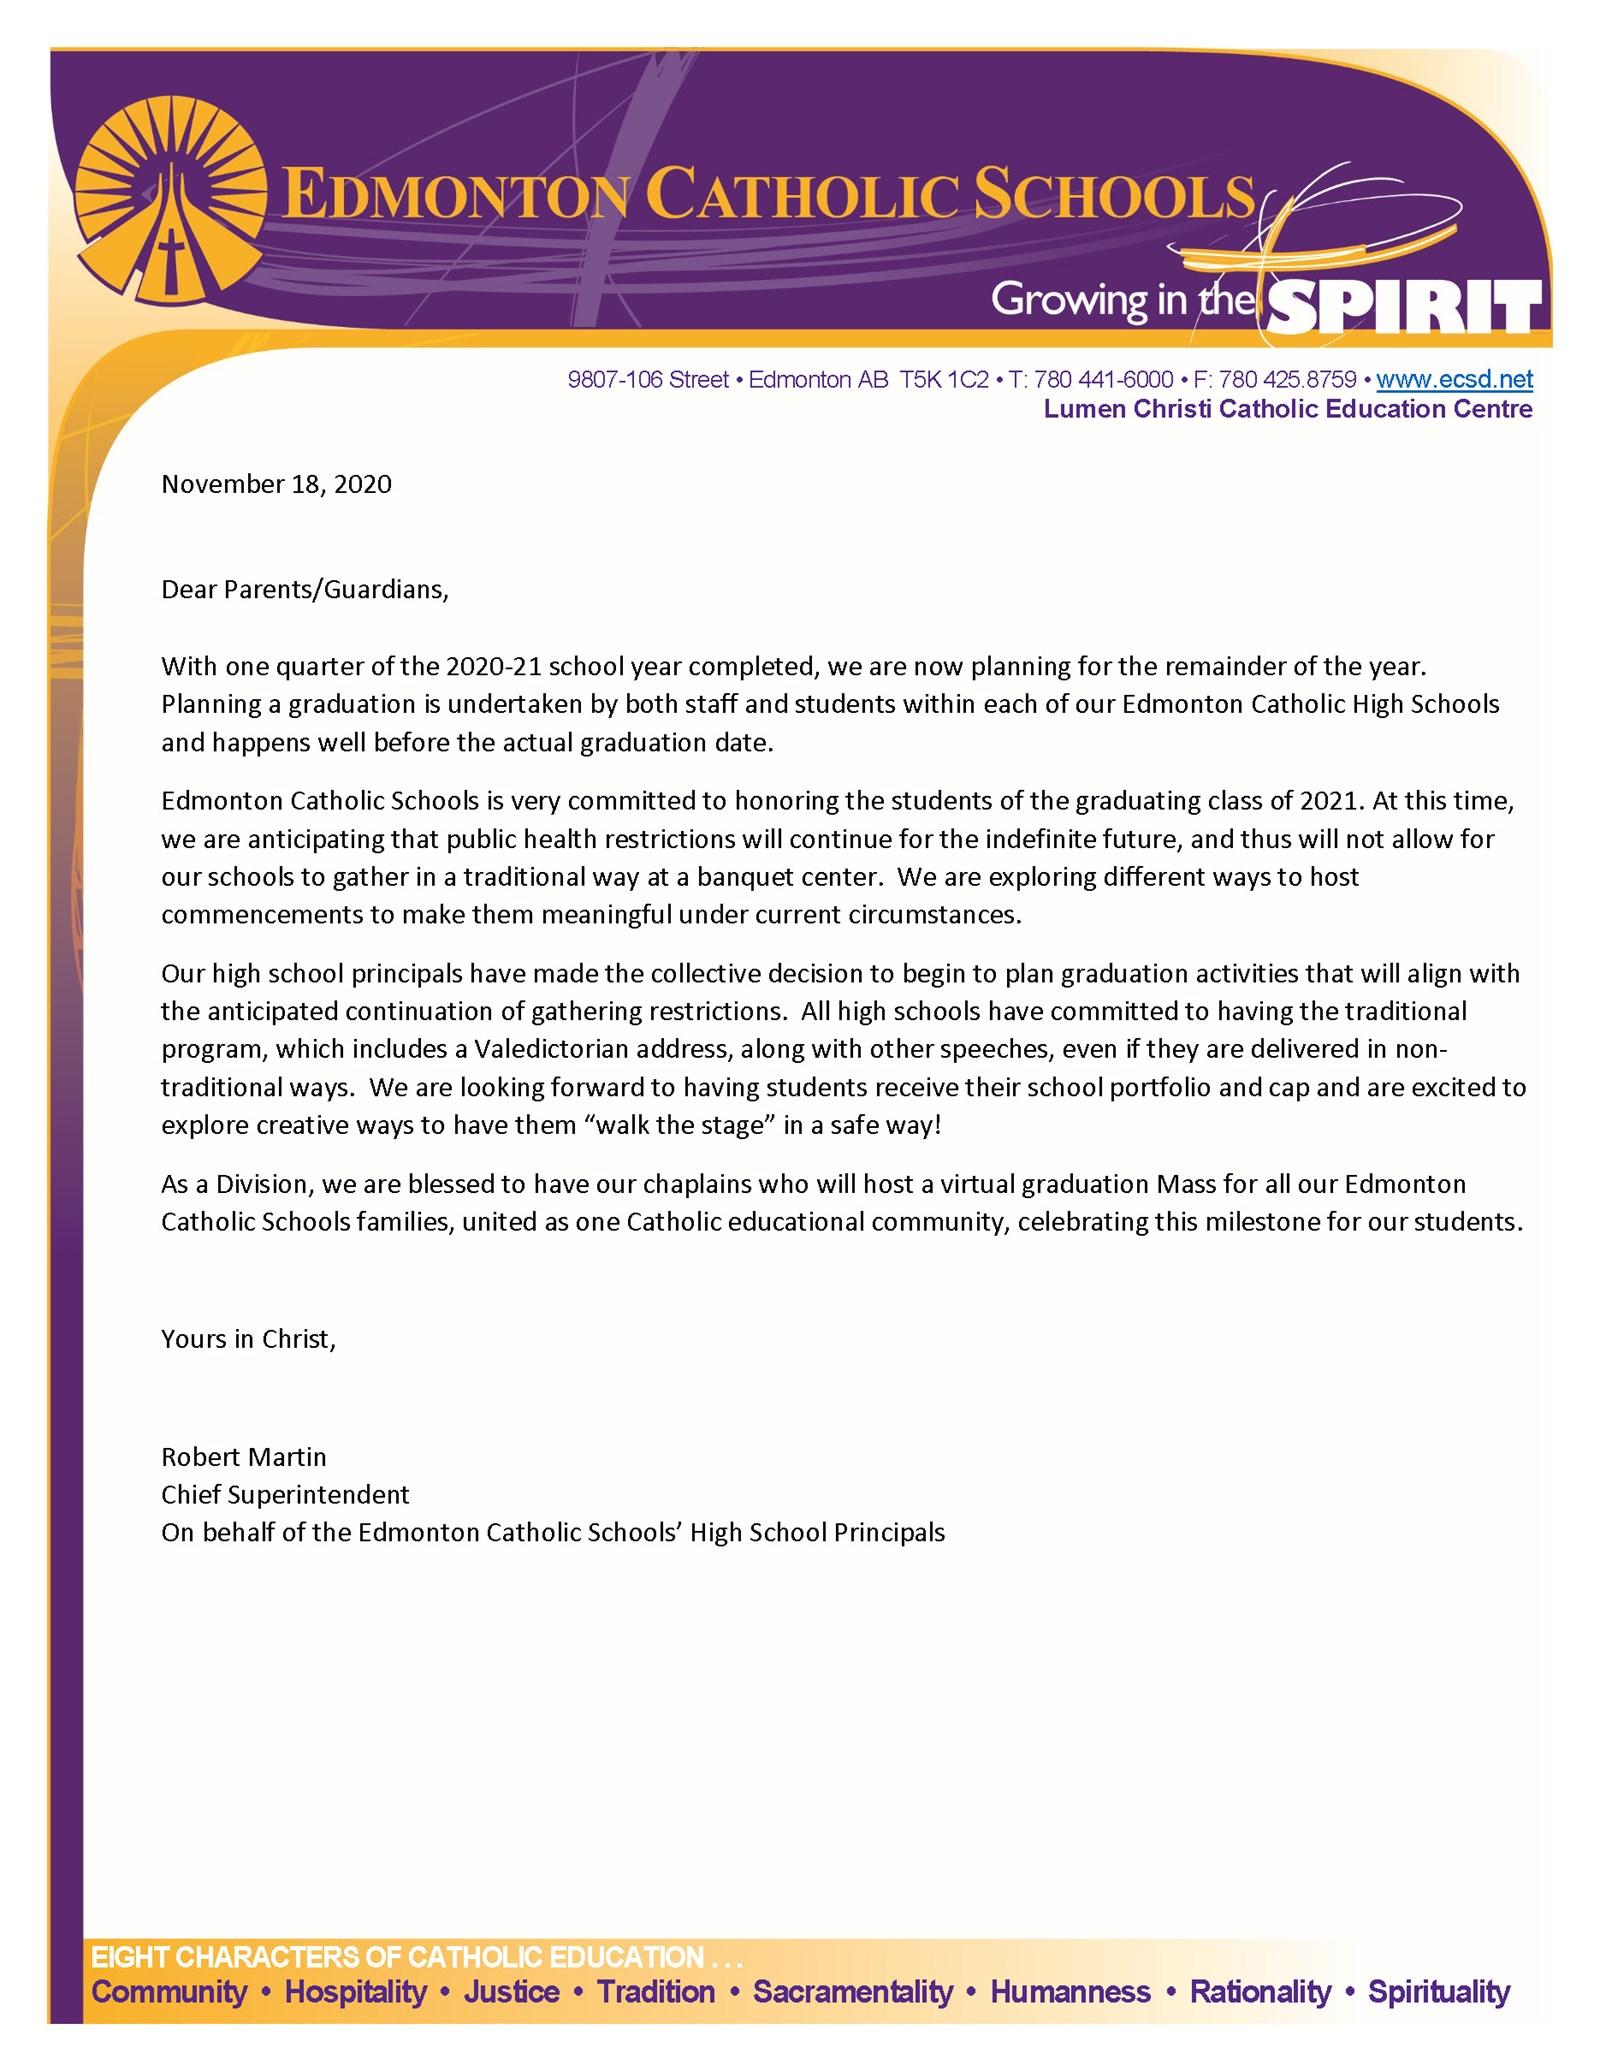 Graduation_letter_2020-21 (2).jpg